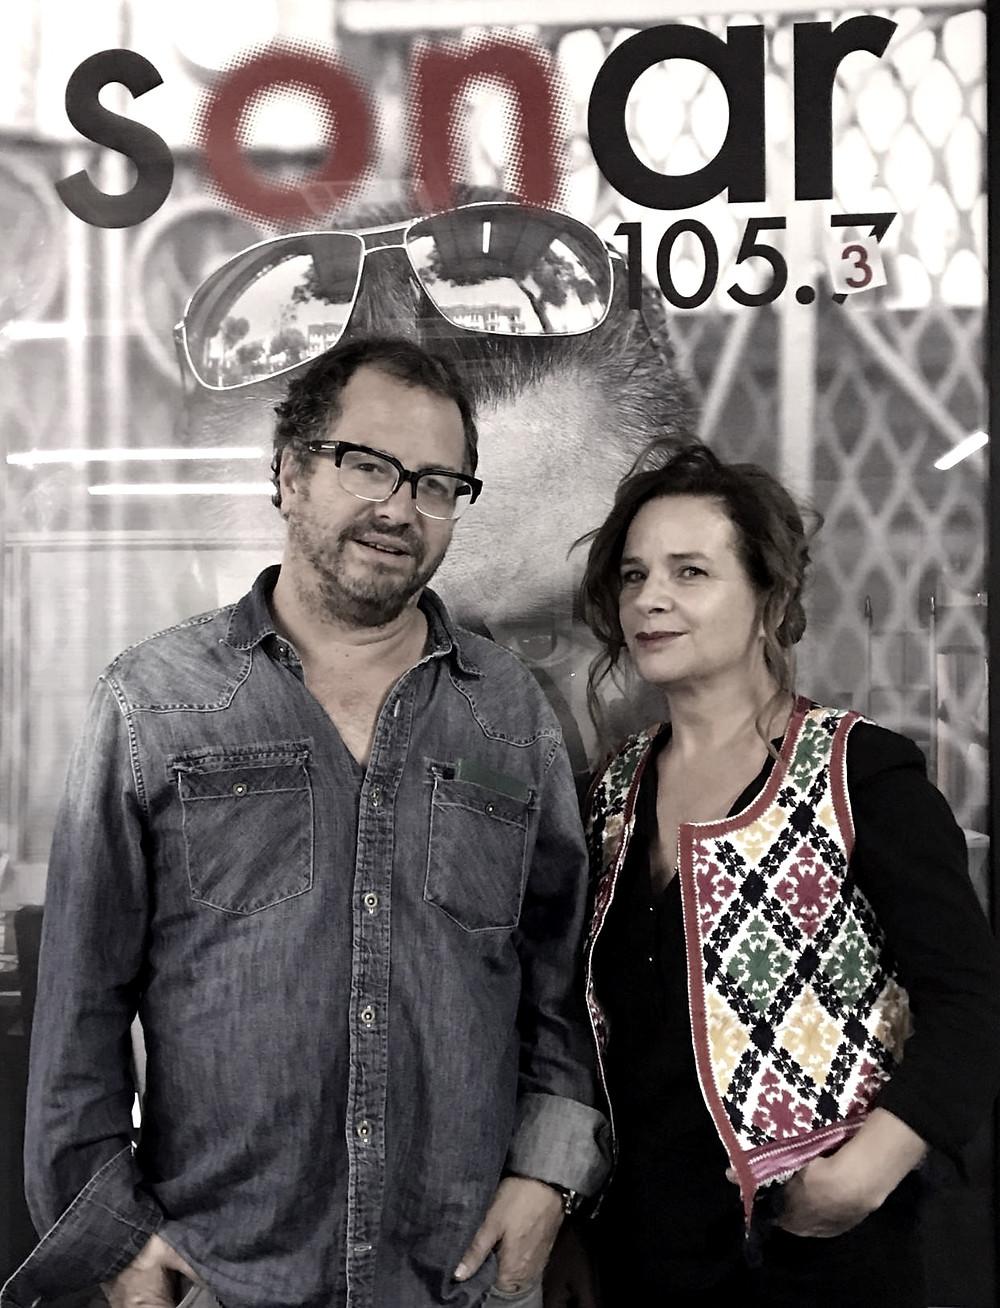 Lemebel_Catalina Mena_radio Tierra